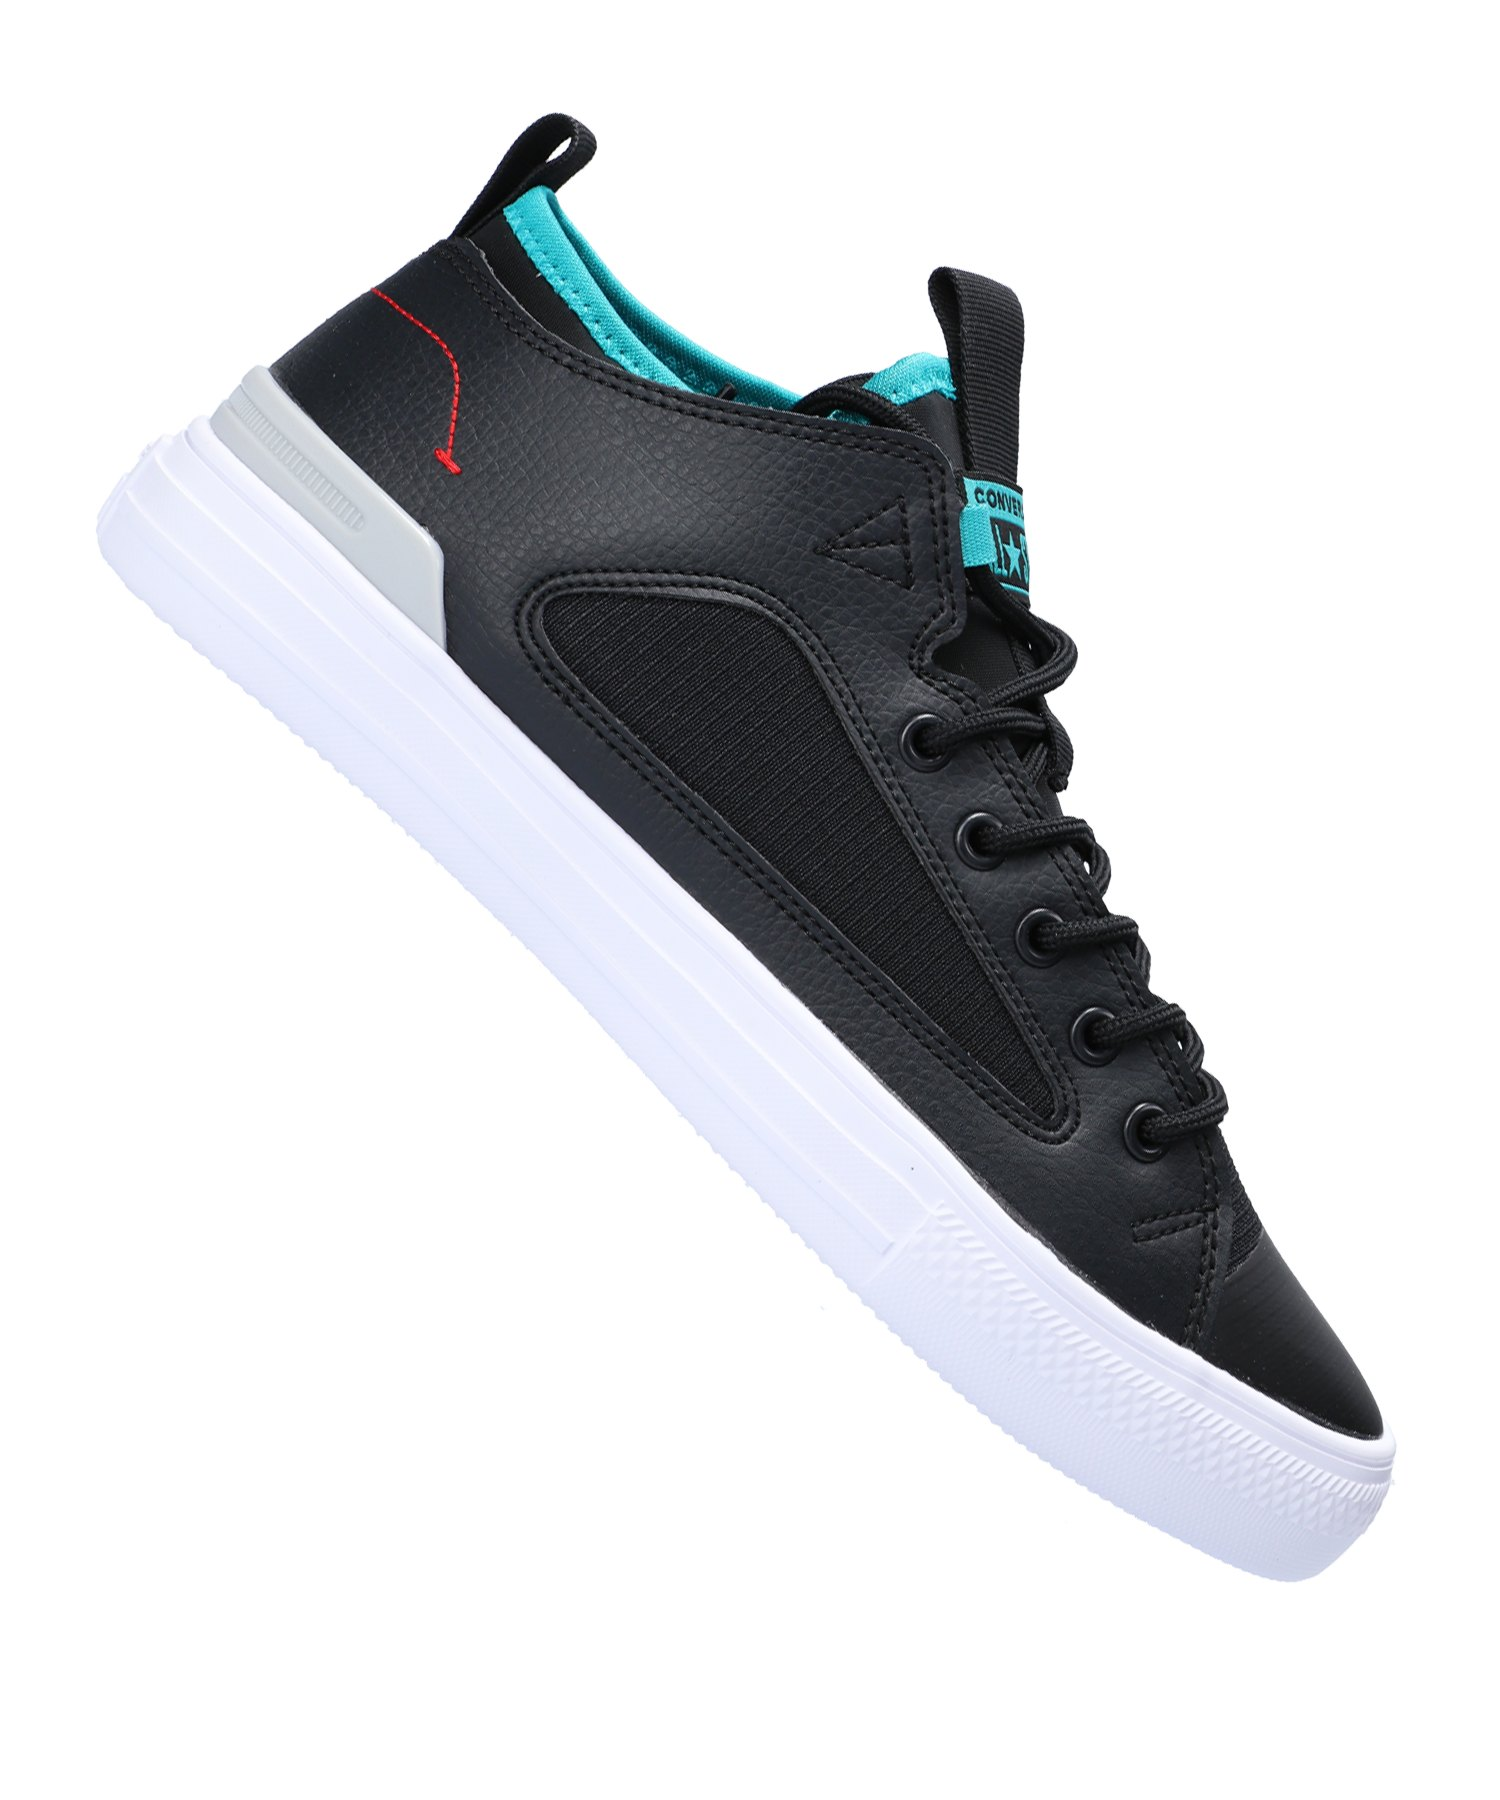 Converse CT AS Ultra OX Sneaker Schwarz Grün F001 - schwarz